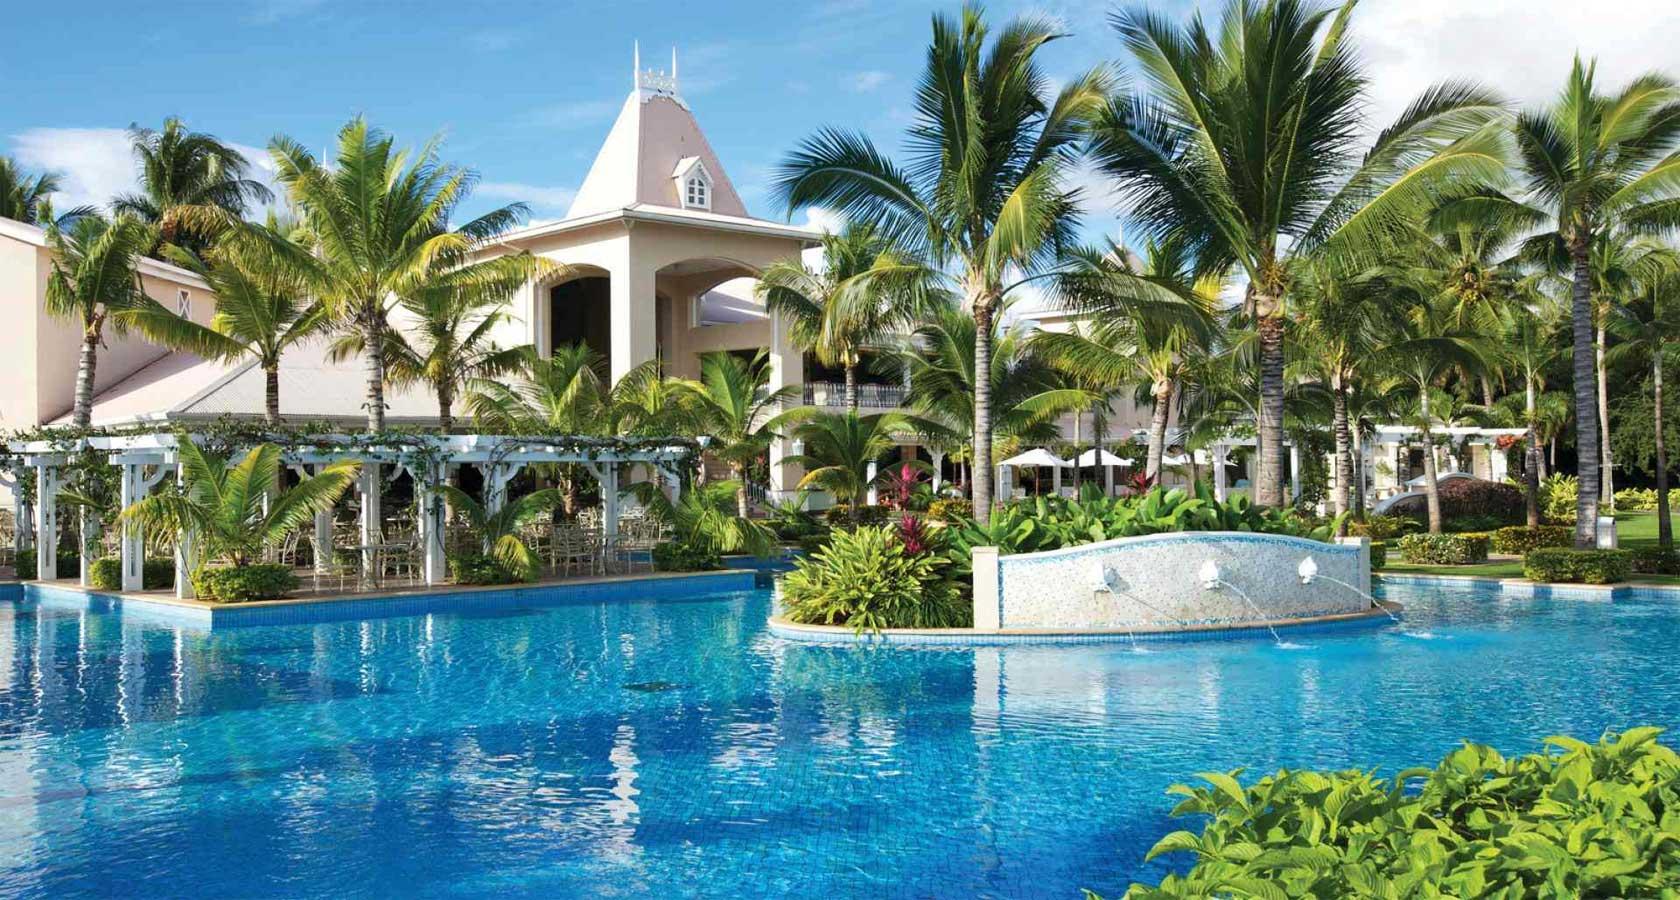 SUGAR BEACH RESORT Mauritius main pool view